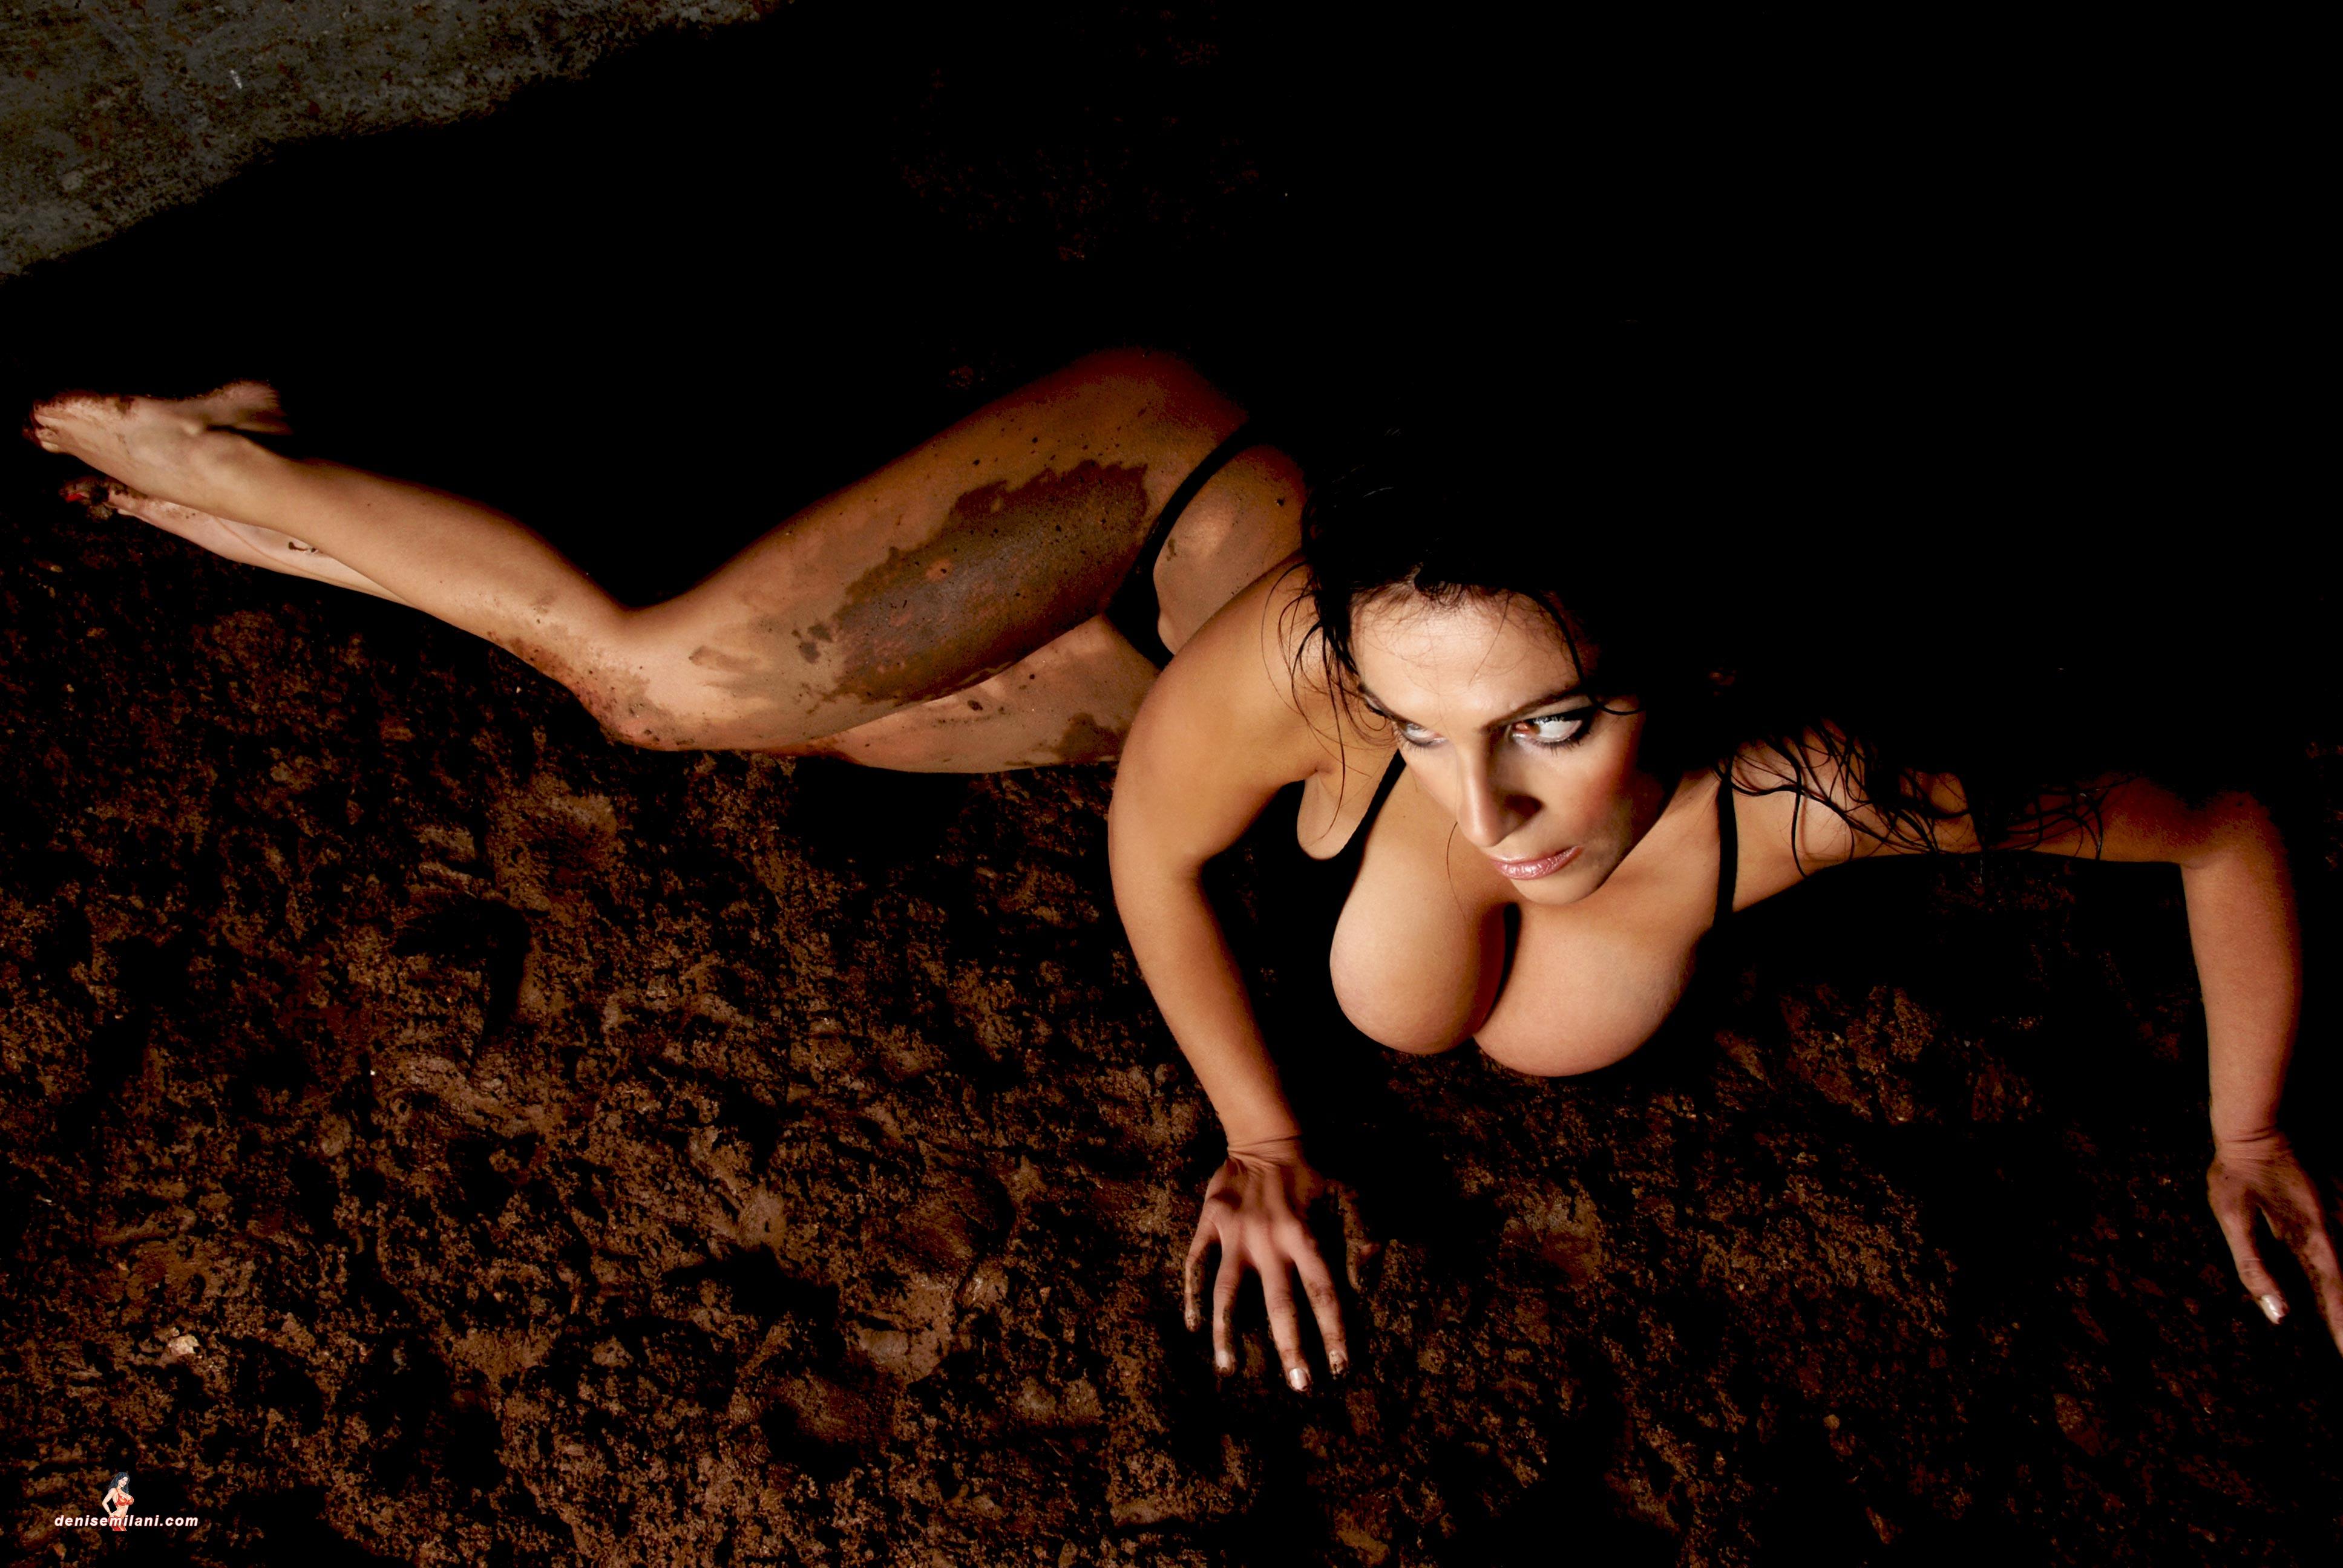 Фото девочка голая в грязи 4 фотография